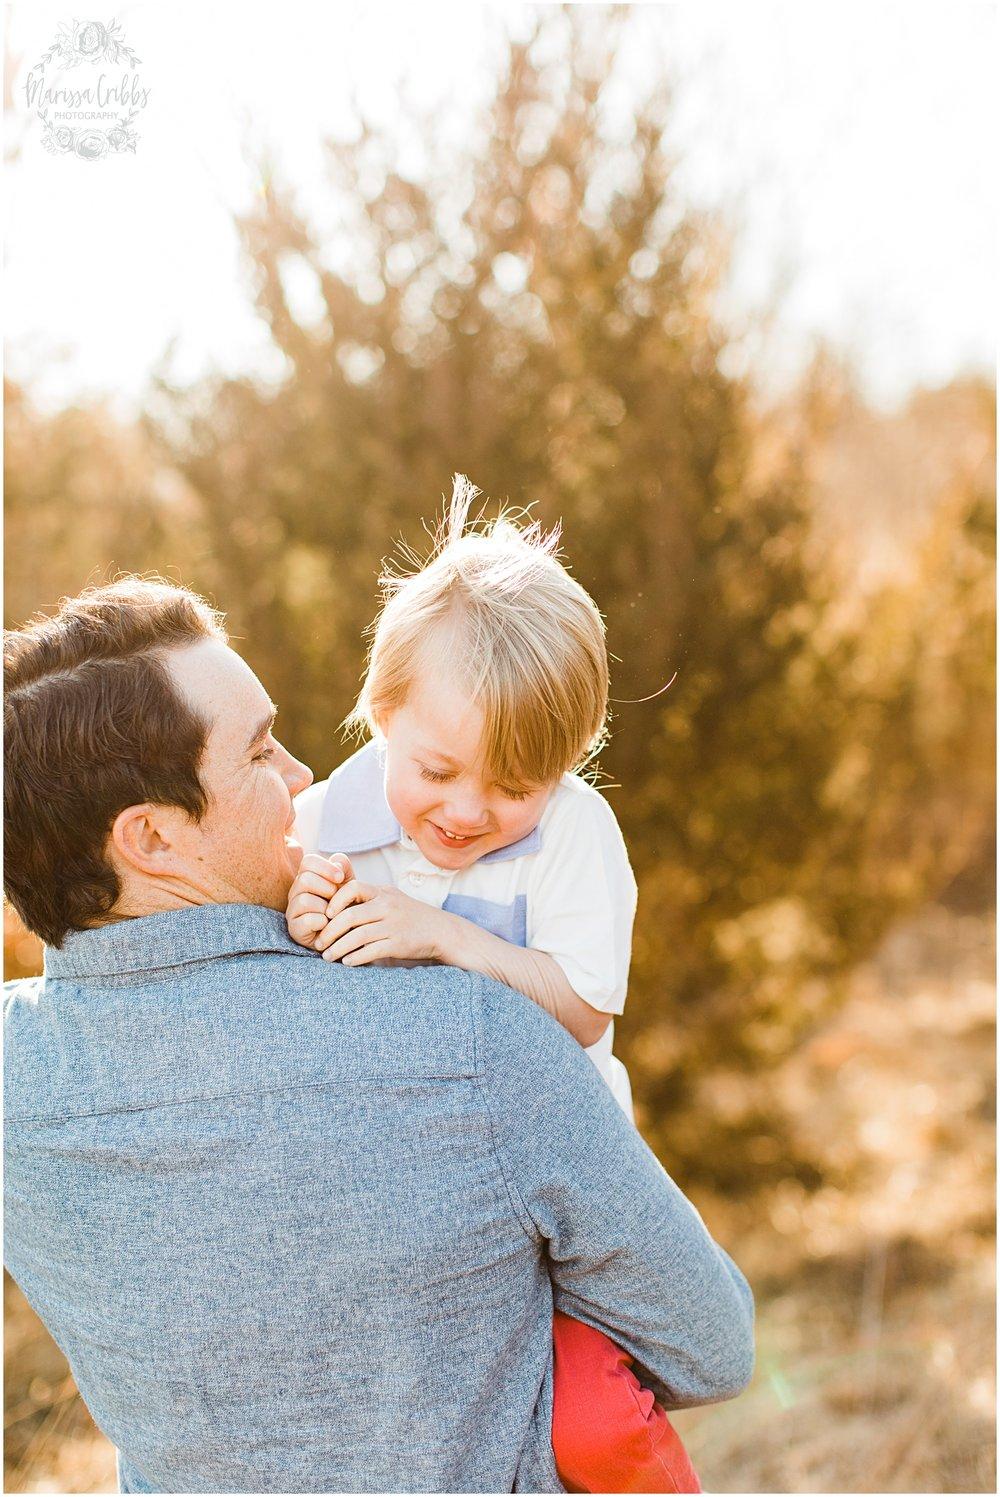 ORWIG FAMILY | MARISSA CRIBBS PHOTOGRAPHY_4235.jpg